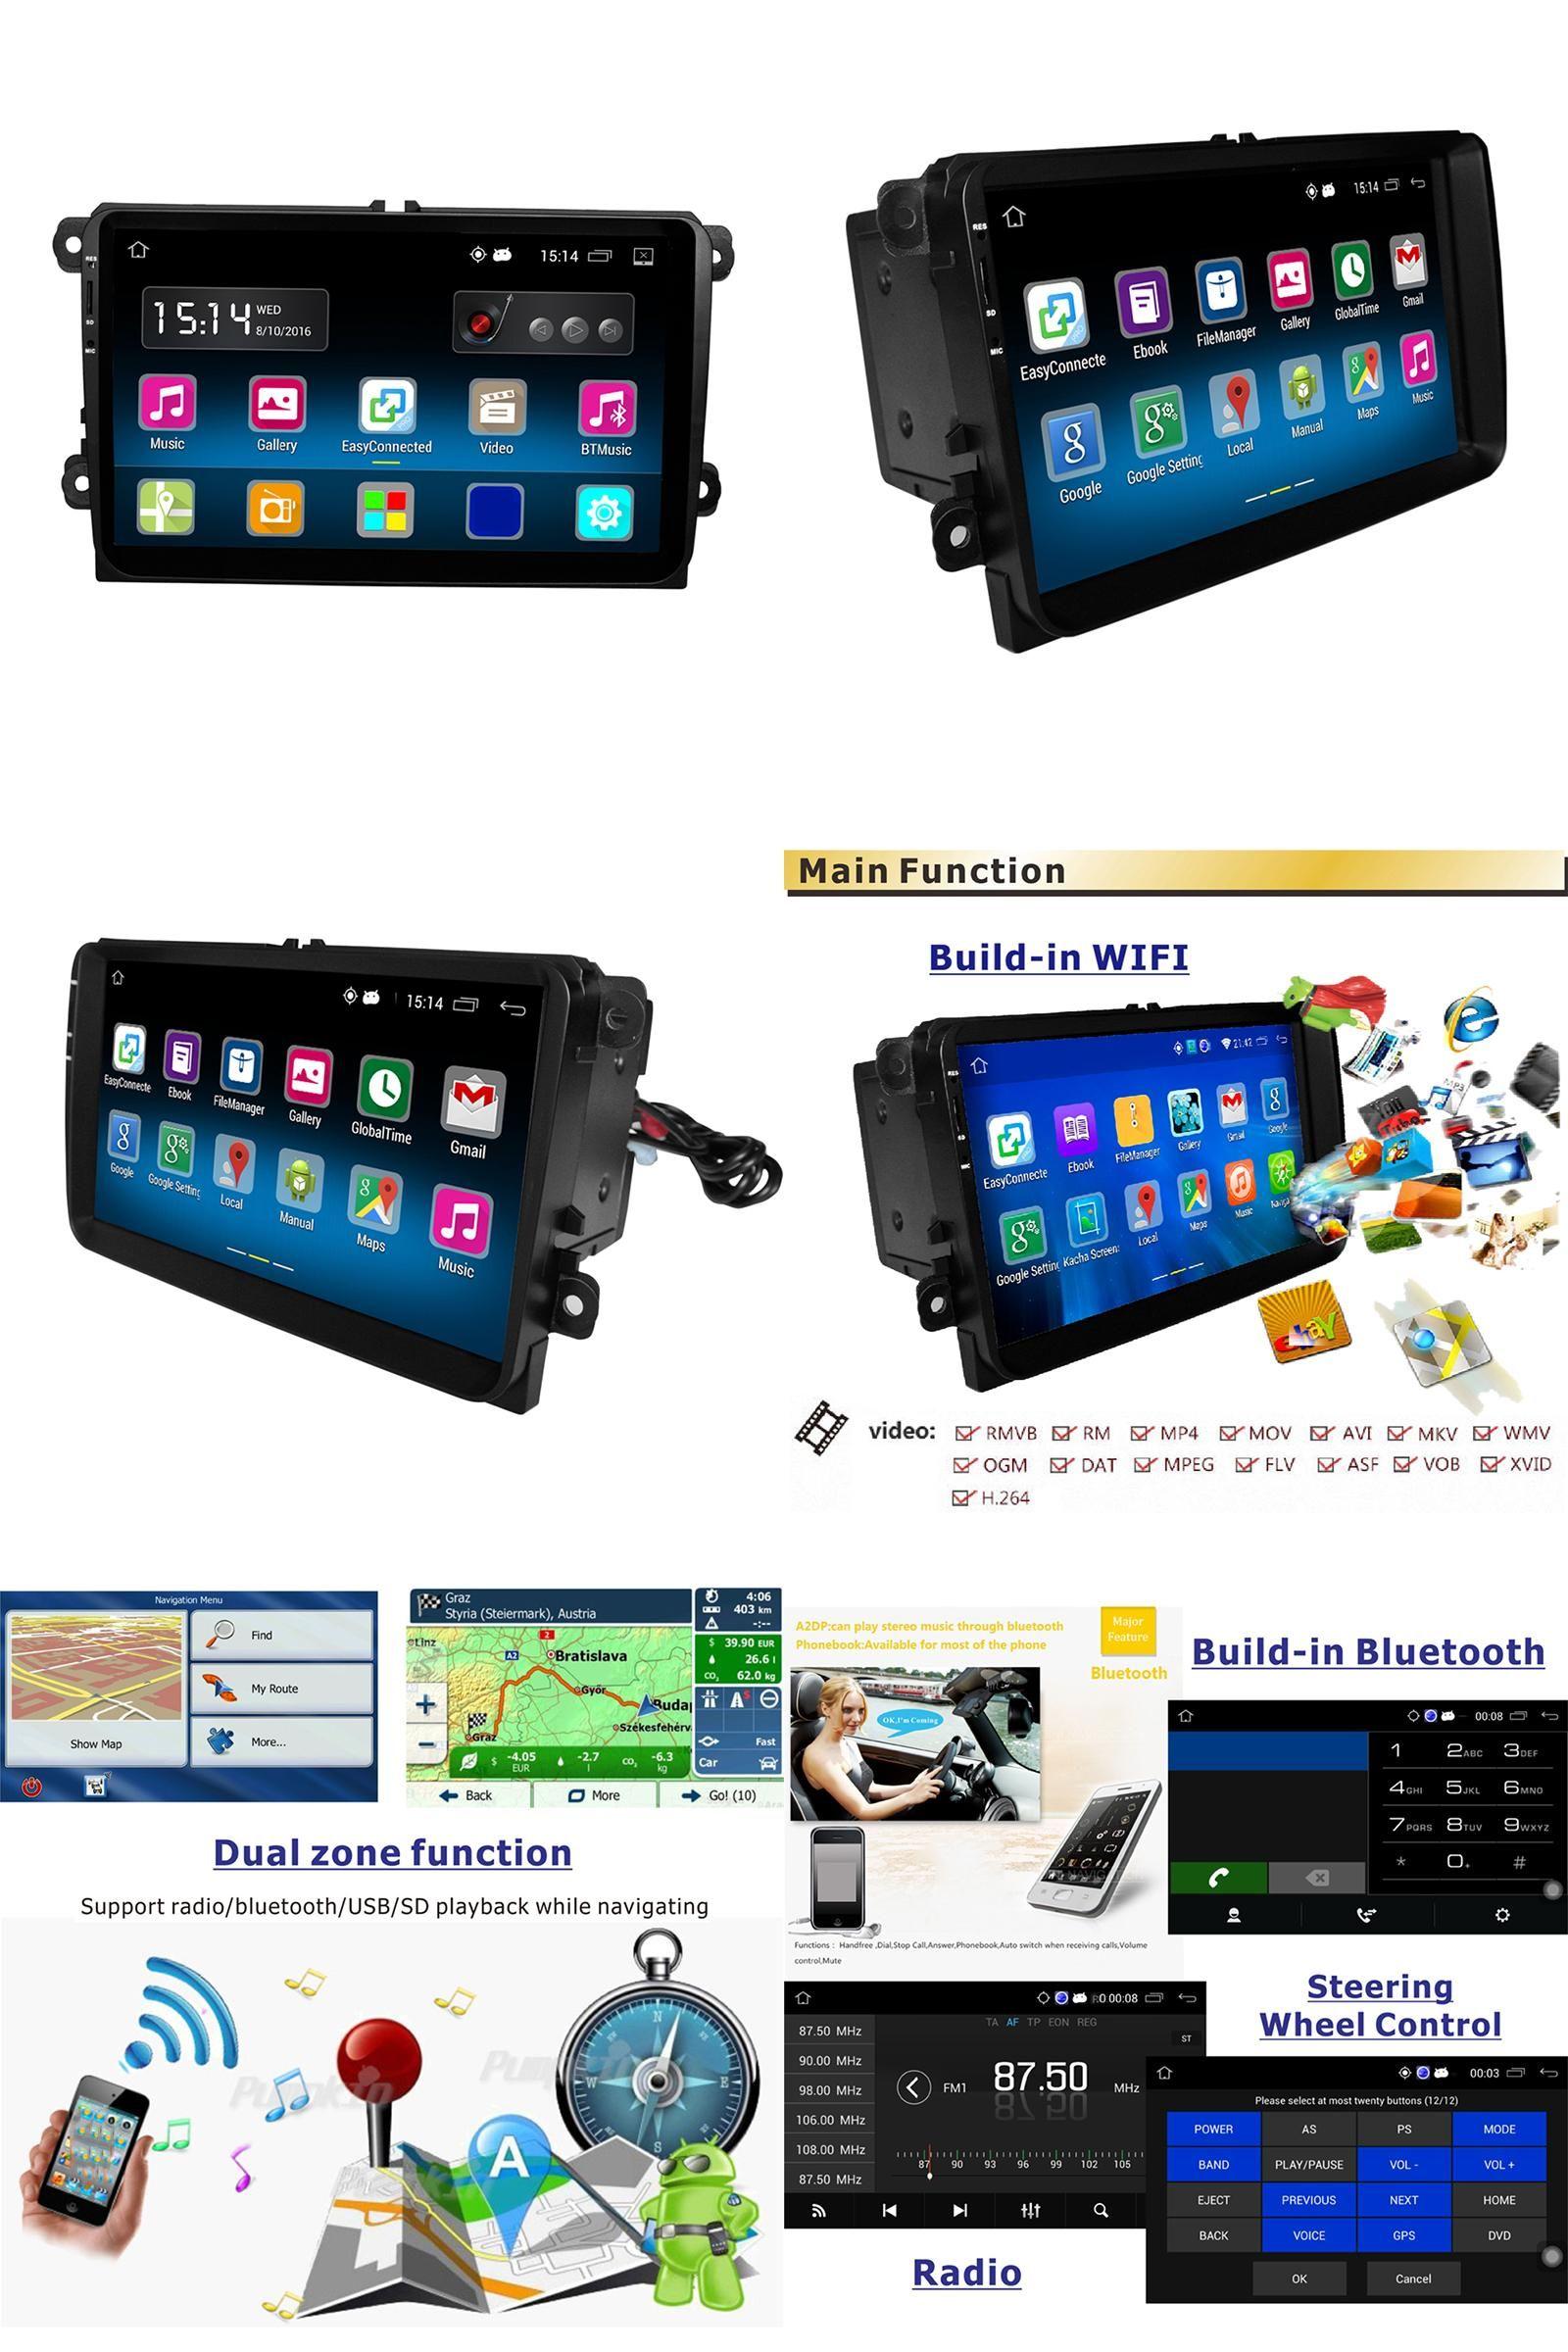 Mk5 mk6 golf gti 2016 car golf mk5 radio golf mk5 mk6 car stereo dvd -  Visit To Buy Rm Vwty91 Android 5 1 2din Car Radio Stereo Player Gps